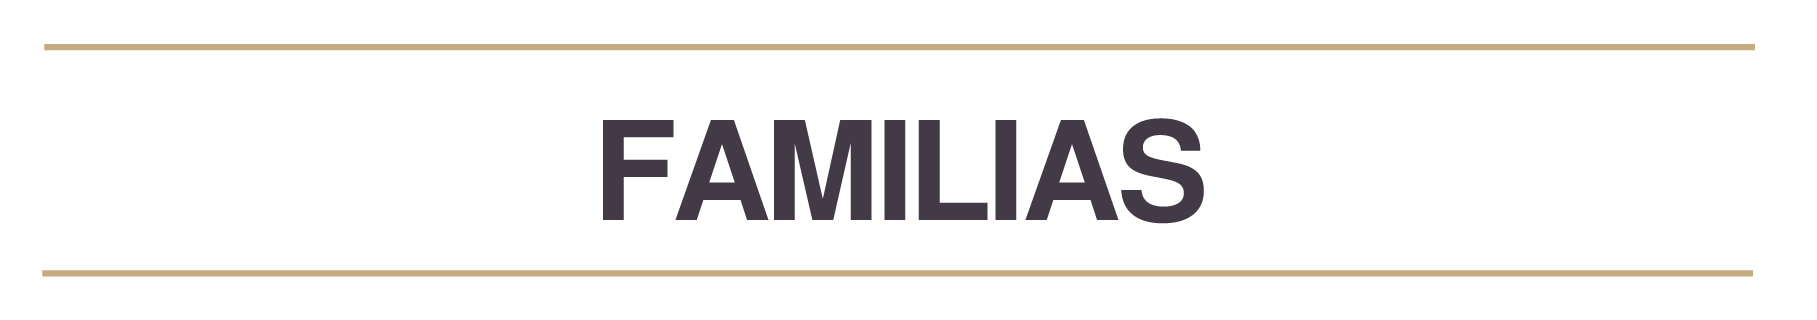 FAMILIA-01